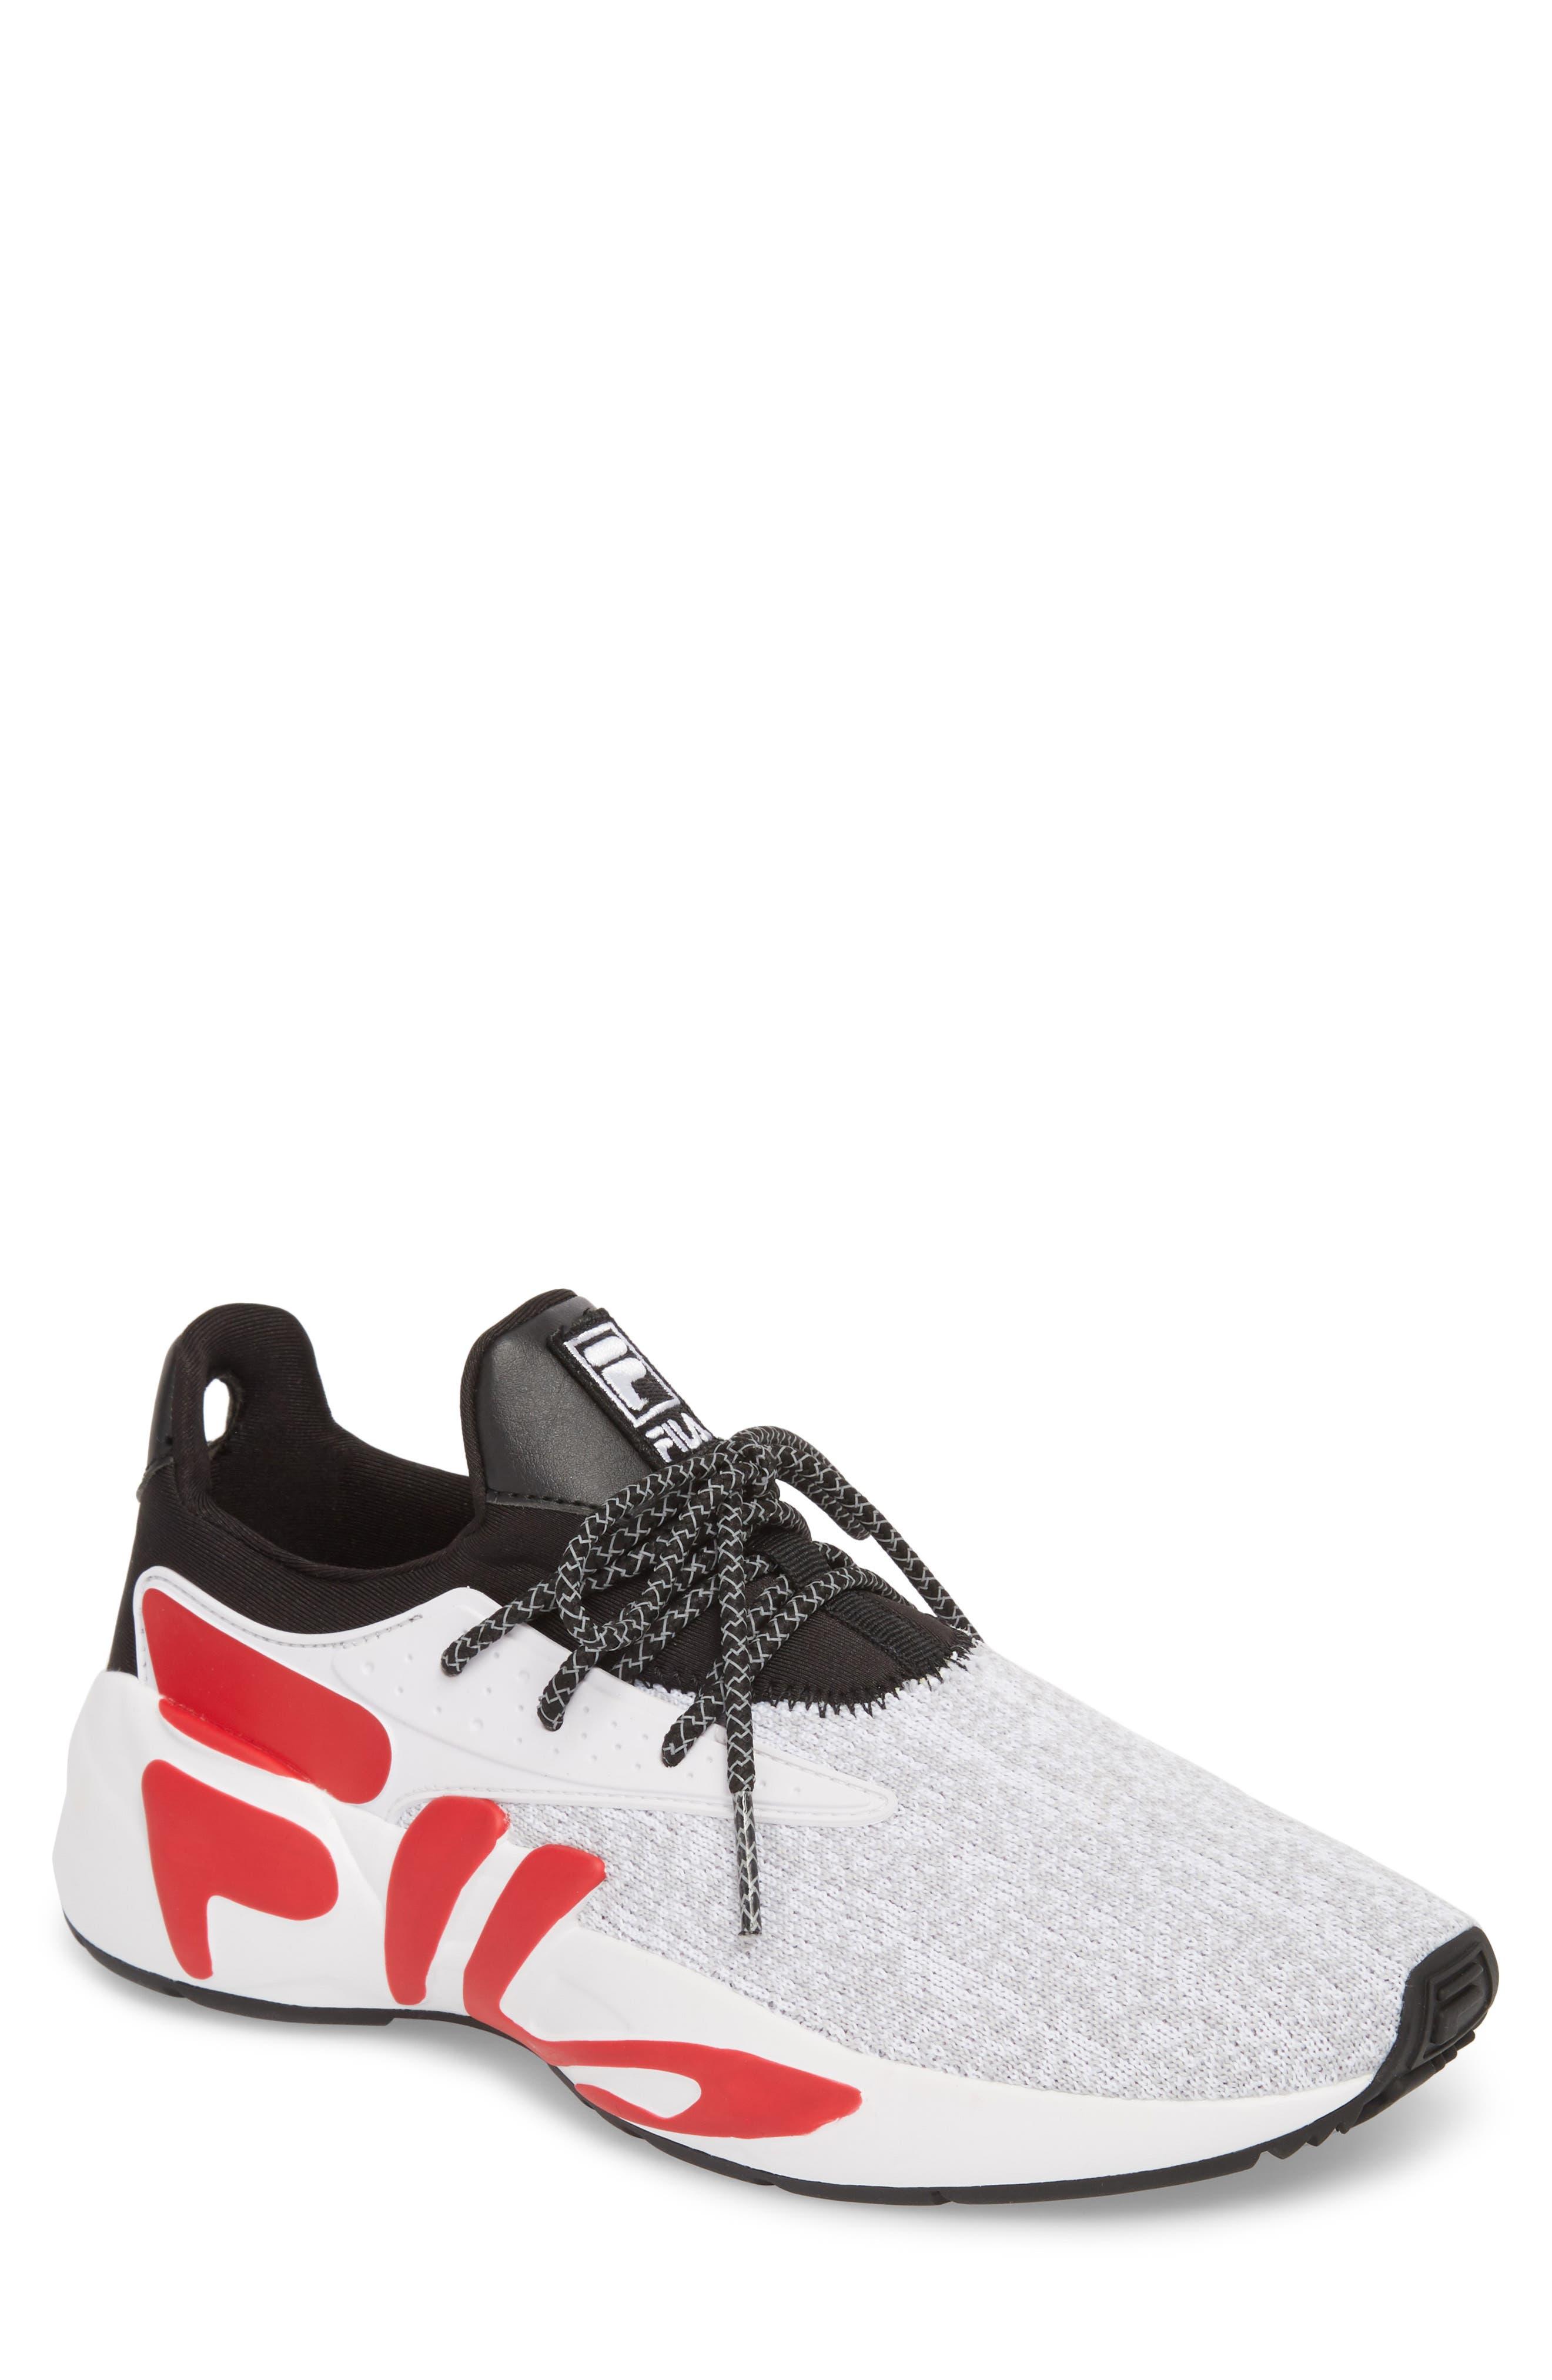 Mindbreaker 2.0 Sneaker,                             Main thumbnail 1, color,                             BLACK/ WHITE/ RED